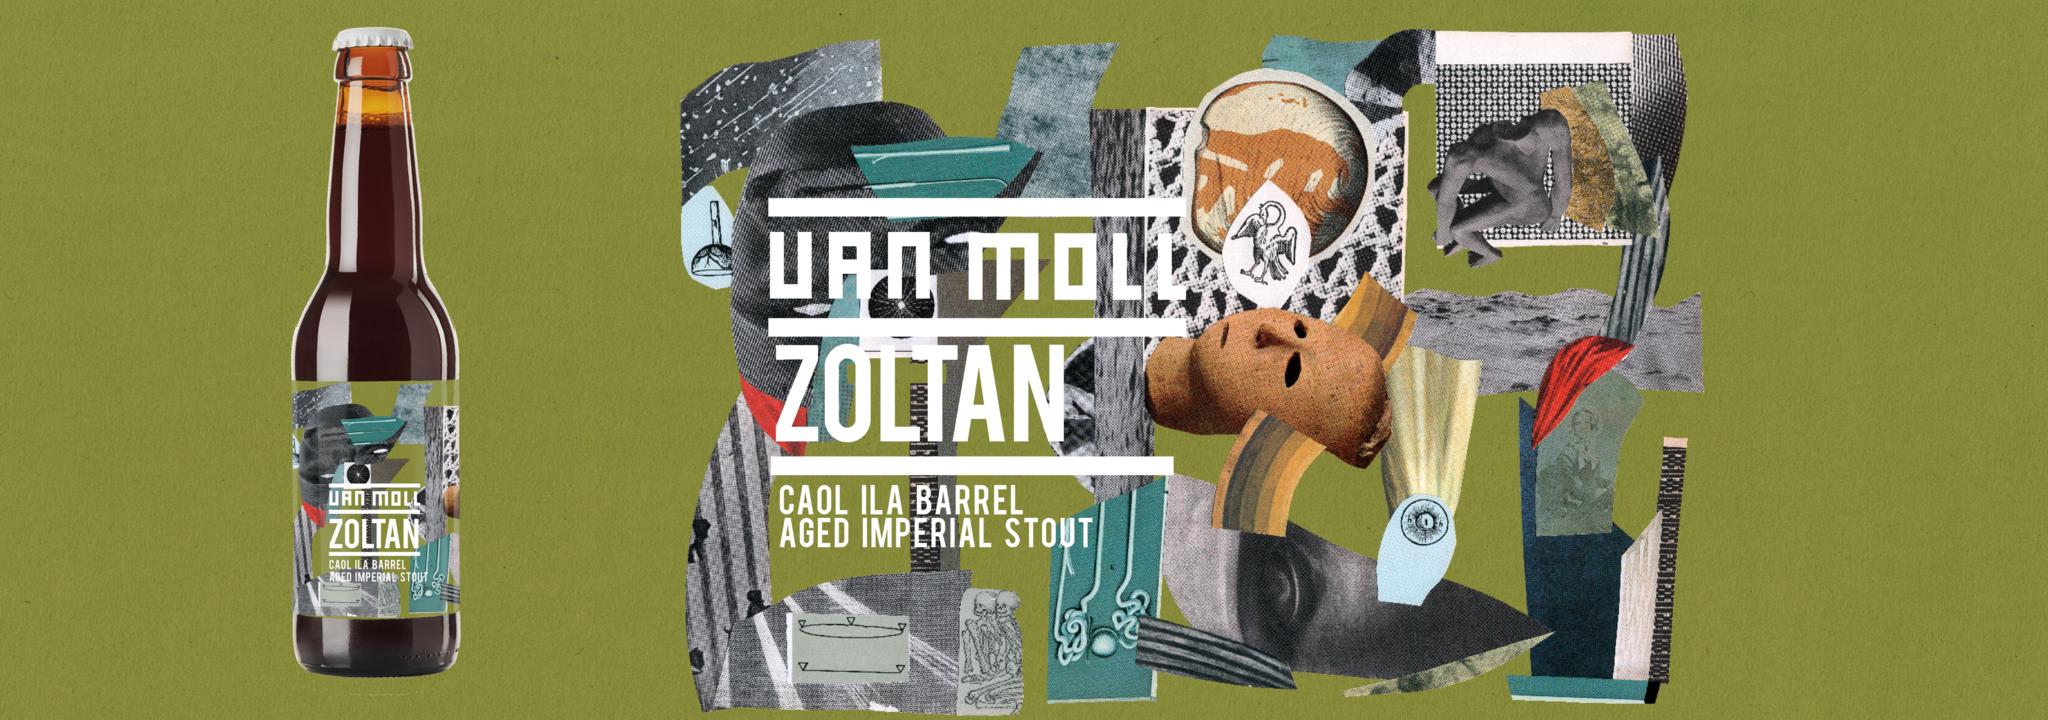 Zoltan_ENG